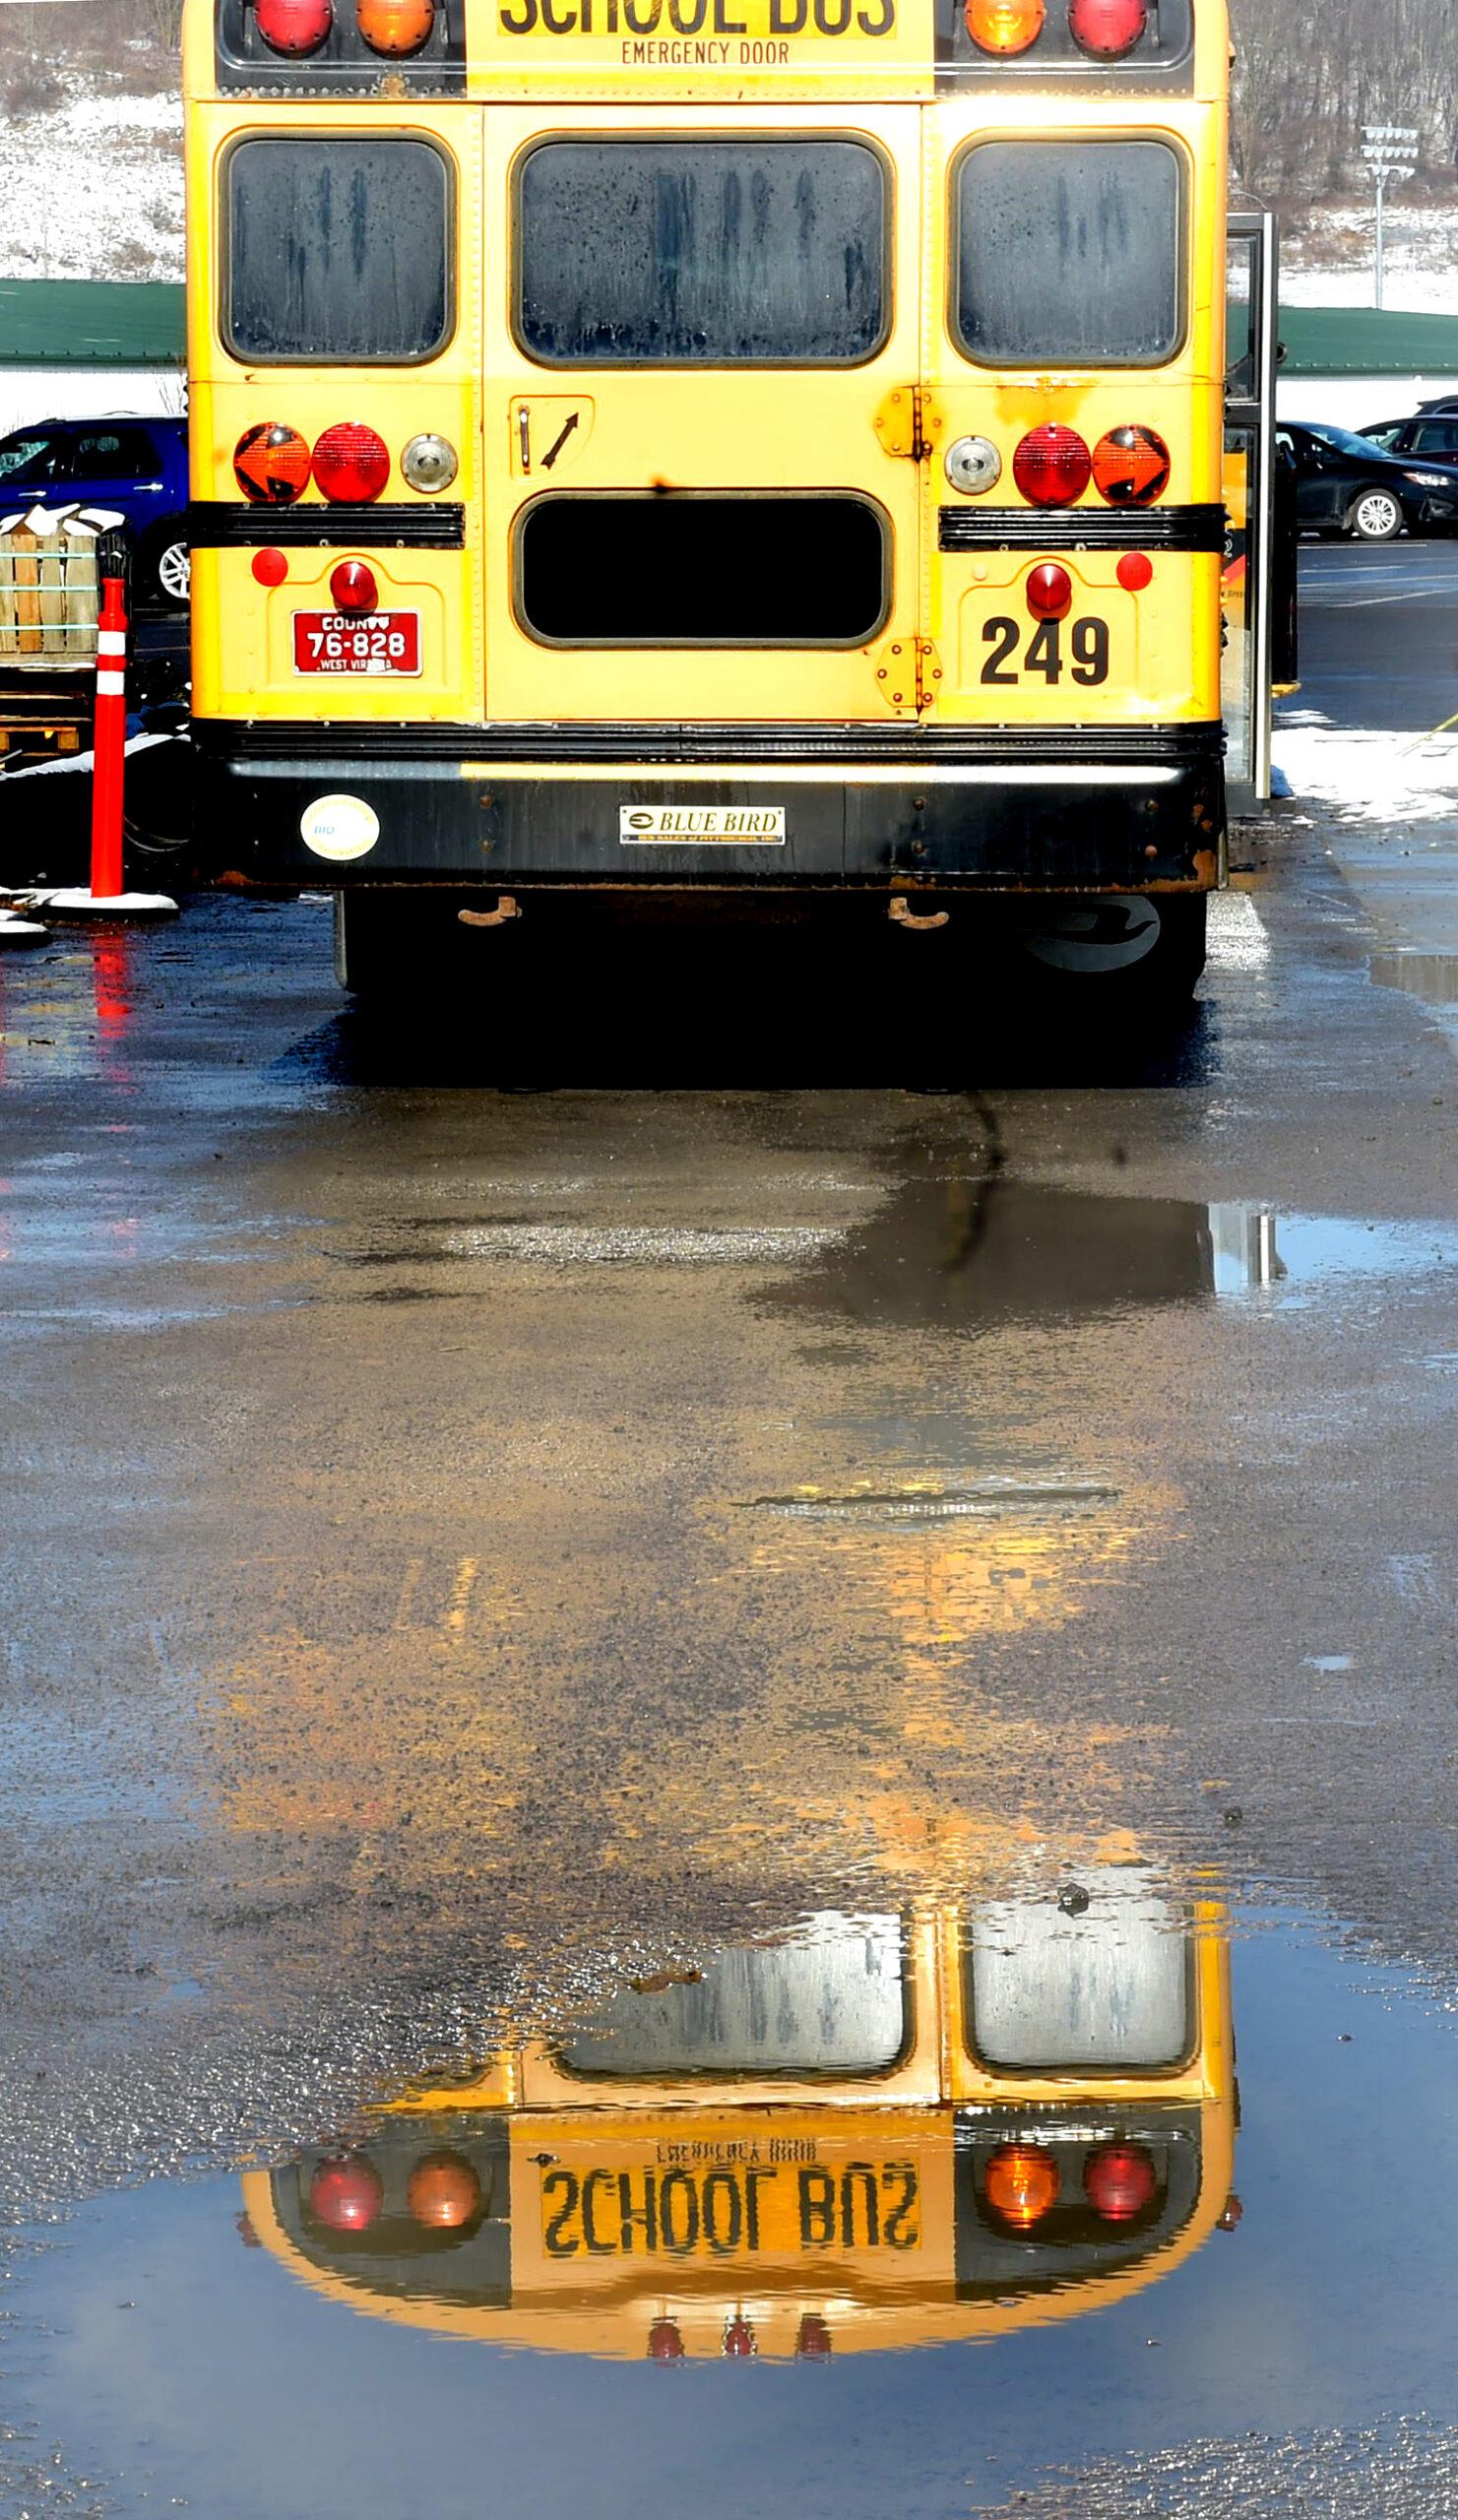 school bus reflection